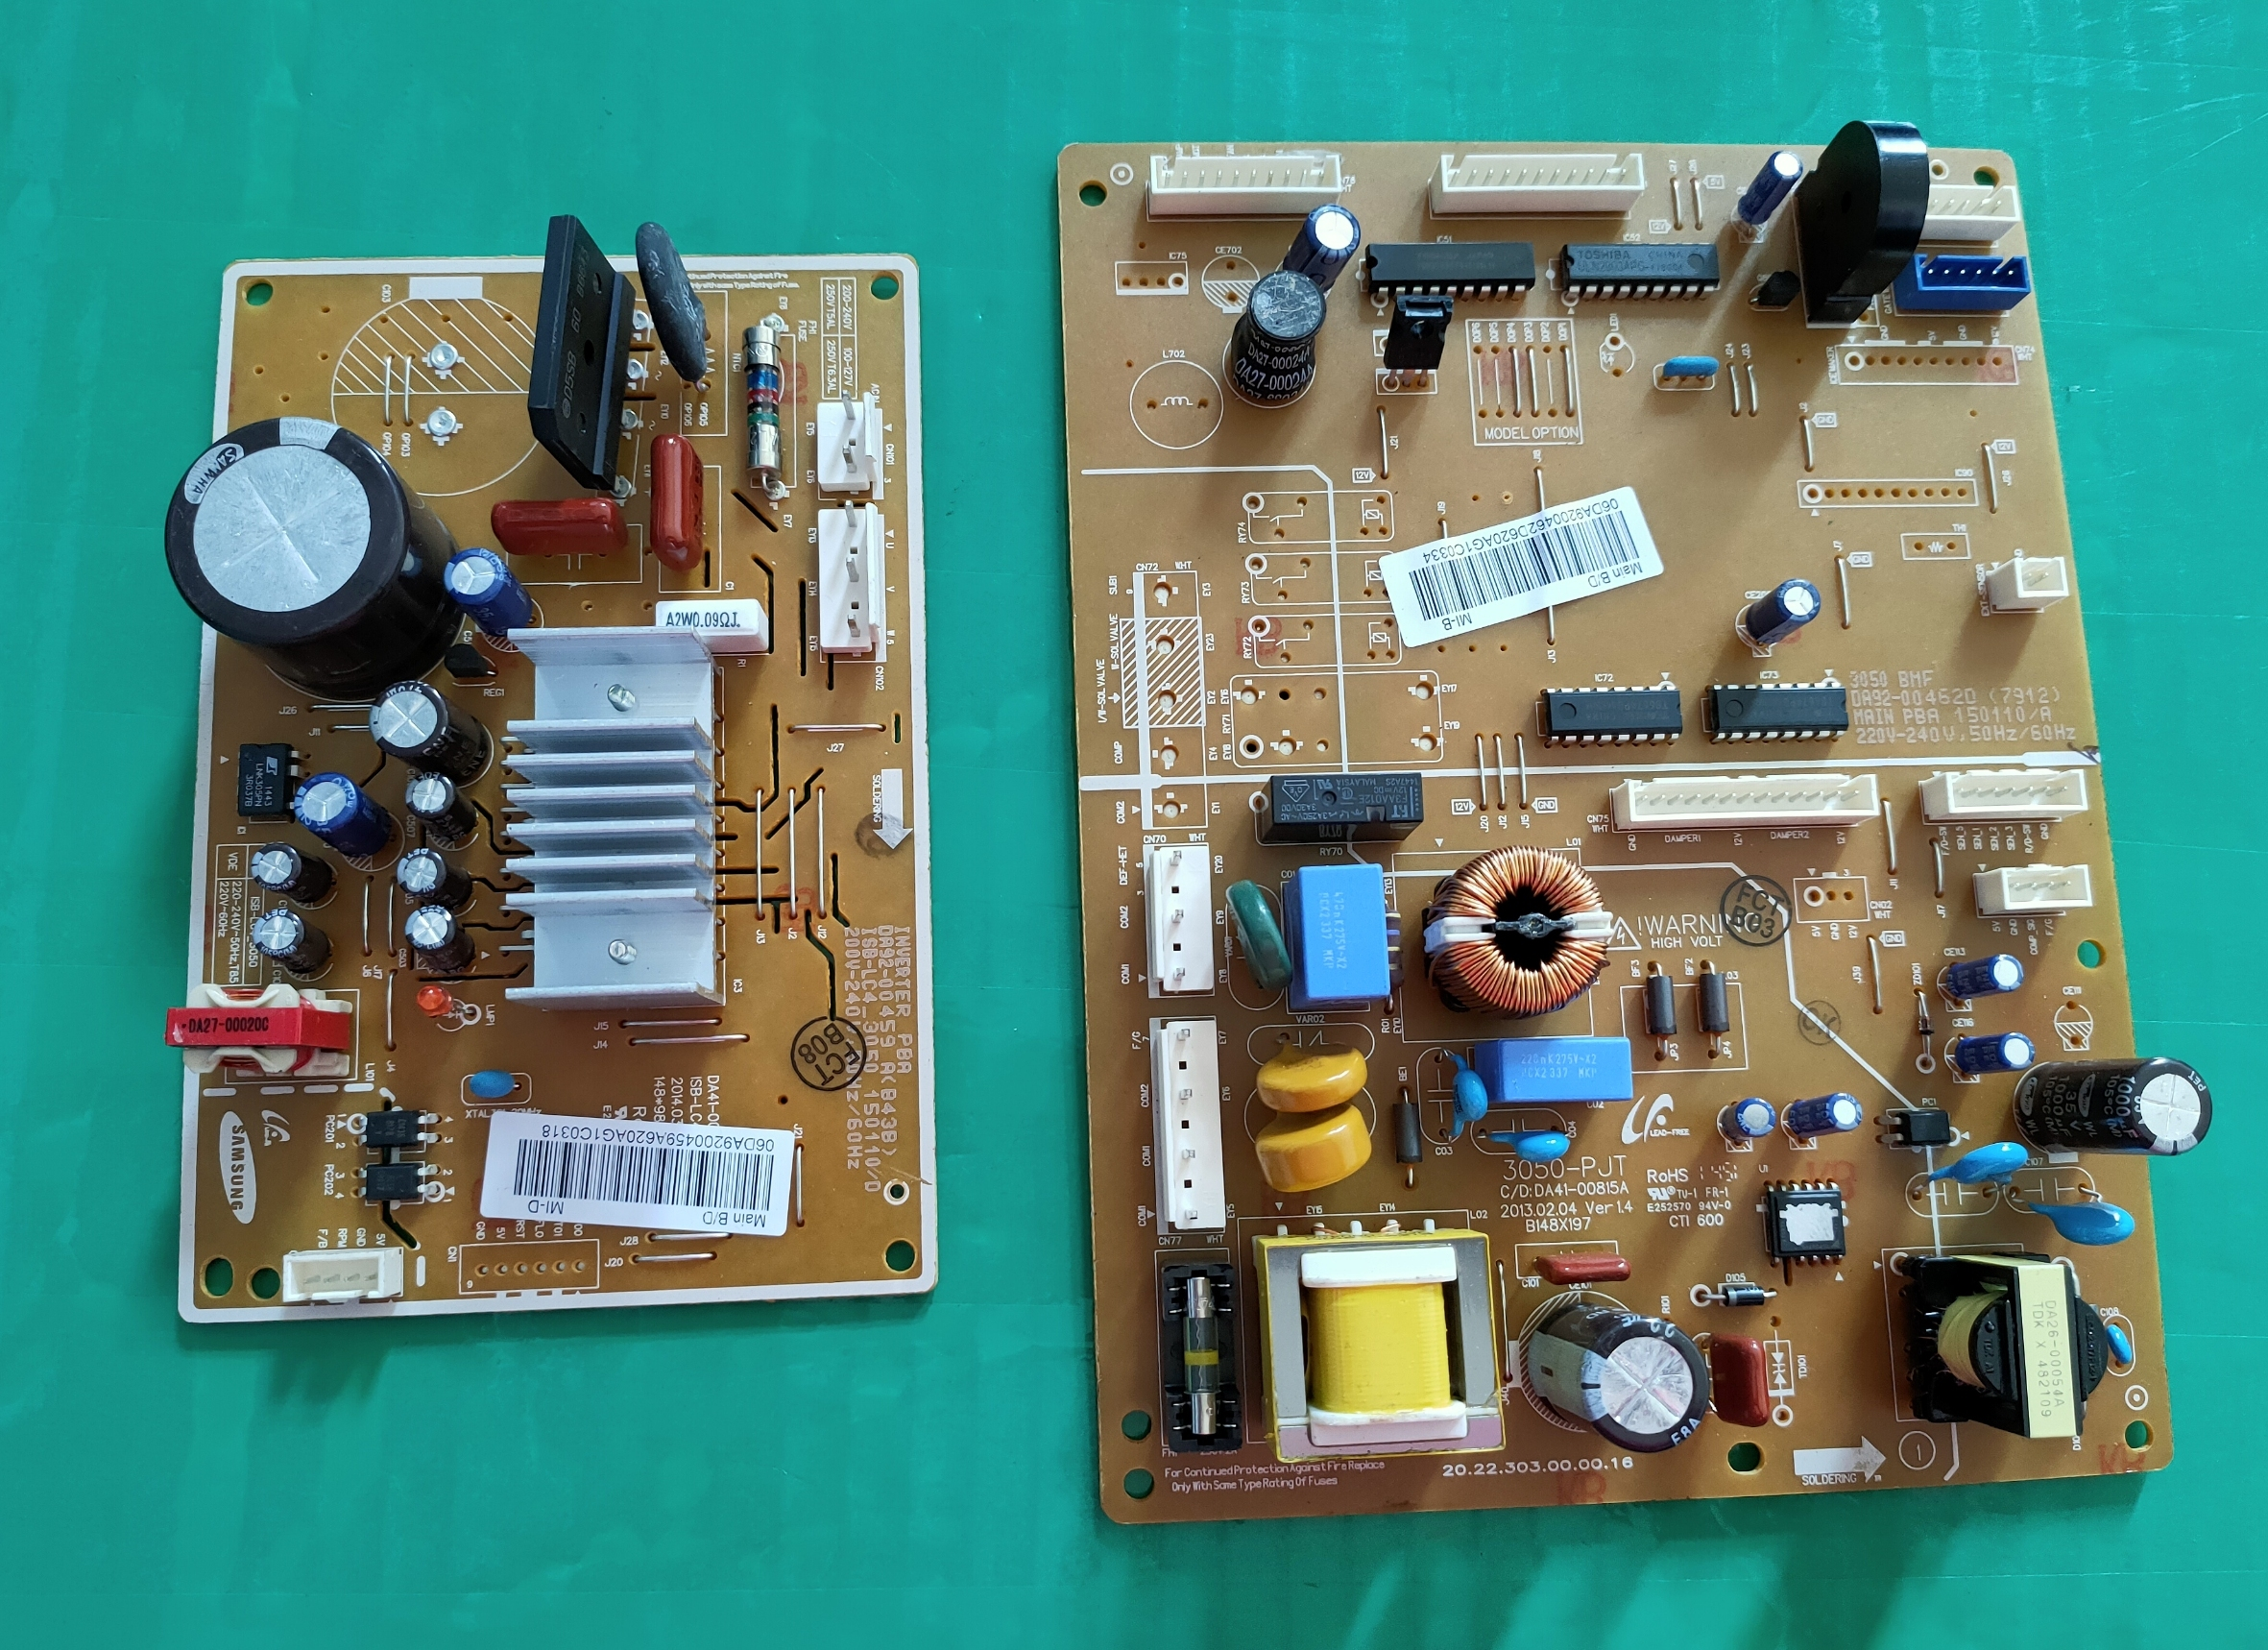 Temperate Good Working For Refrigerator Computer Board Power Module Da92-00462d Da92-00462e Da41-00815a Bcd-304wnqisl 286wnqiss1 Board Structural Disabilities